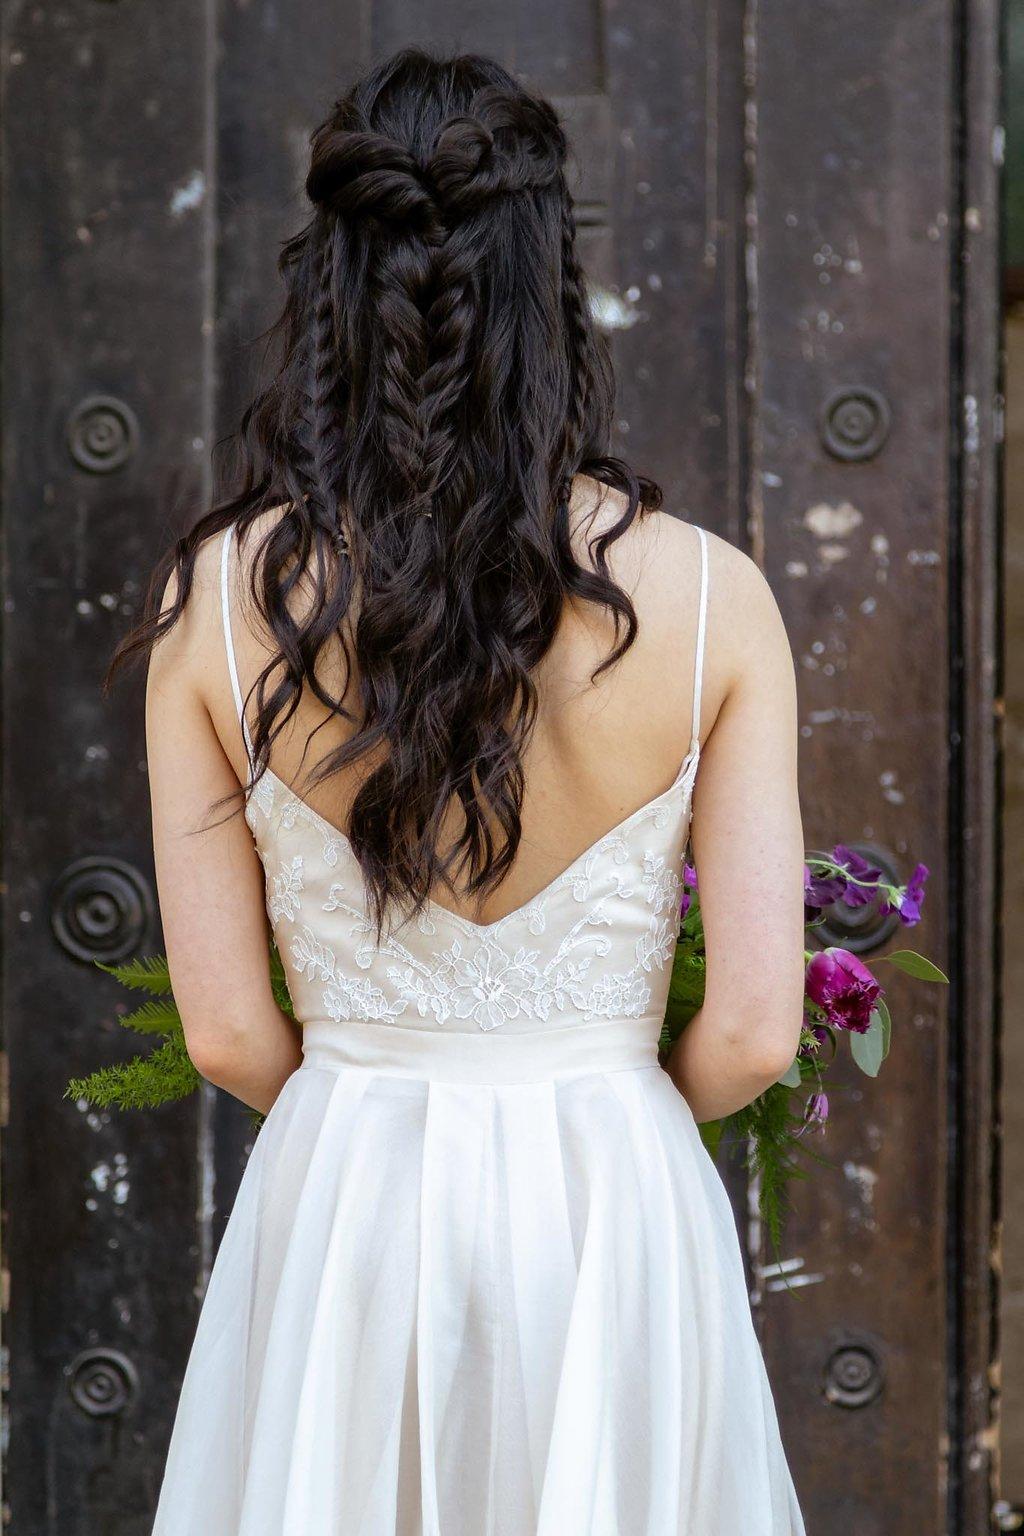 Rock the Purple Love - Gido Weddings - The Asylum Chapel - alternative wedding inspiration 7 - Rock the Purple Love - Gido Weddings - The Asylum Chapel - alternative wedding inspiration 117 - Urban, modern wedding